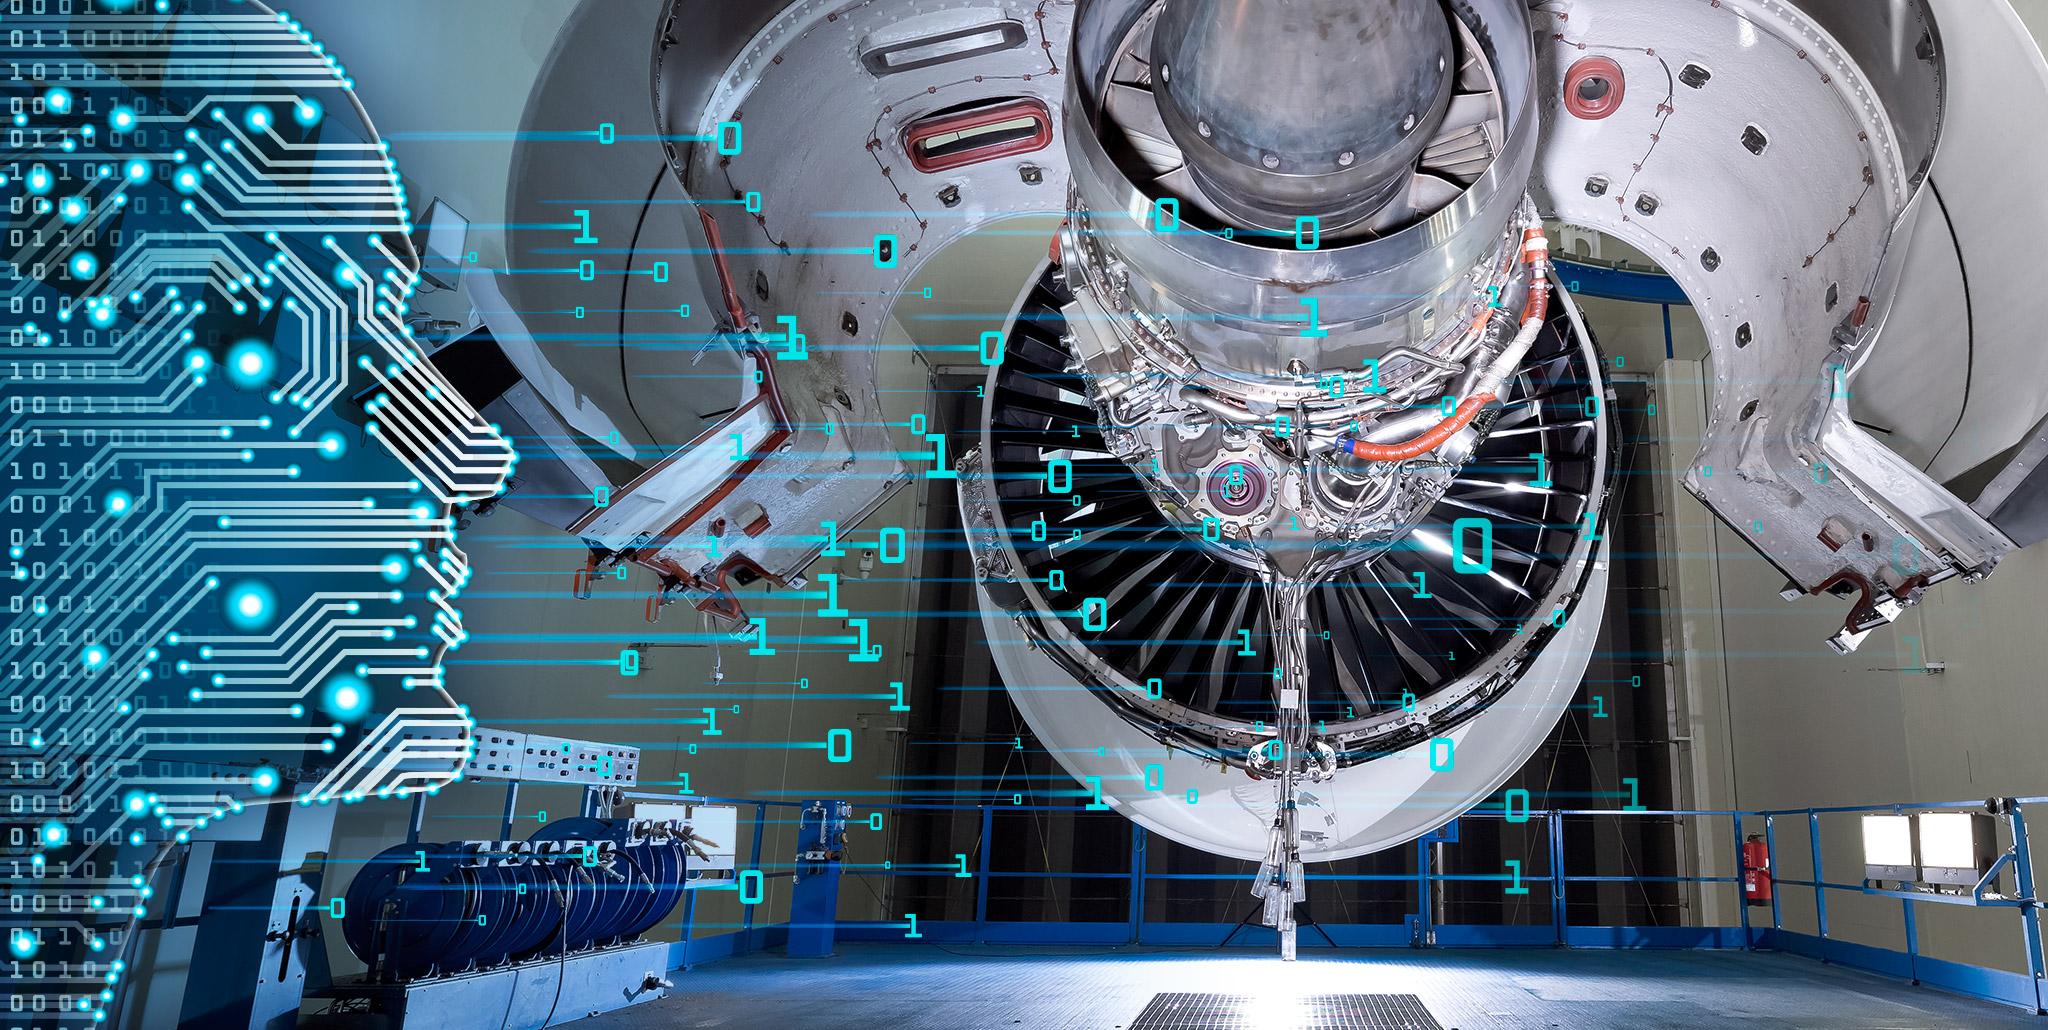 New data management system for engine test data